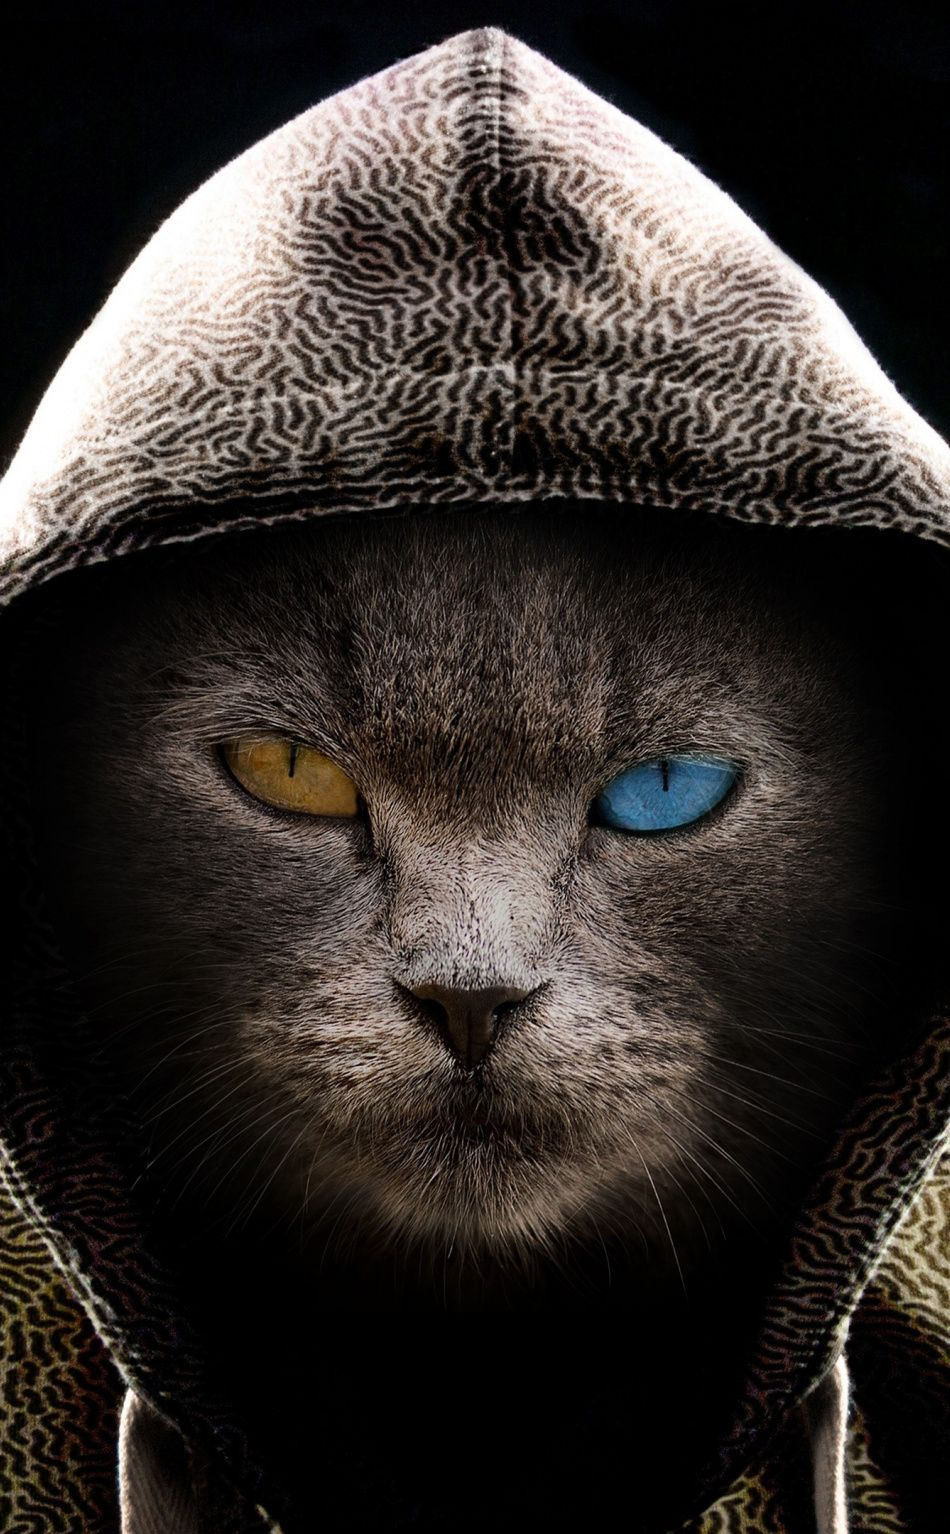 950x1534 Cat In Hood Colored Eyes Wallpaper Bad Cats Cat Wallpaper Iphone Wallpaper Cat